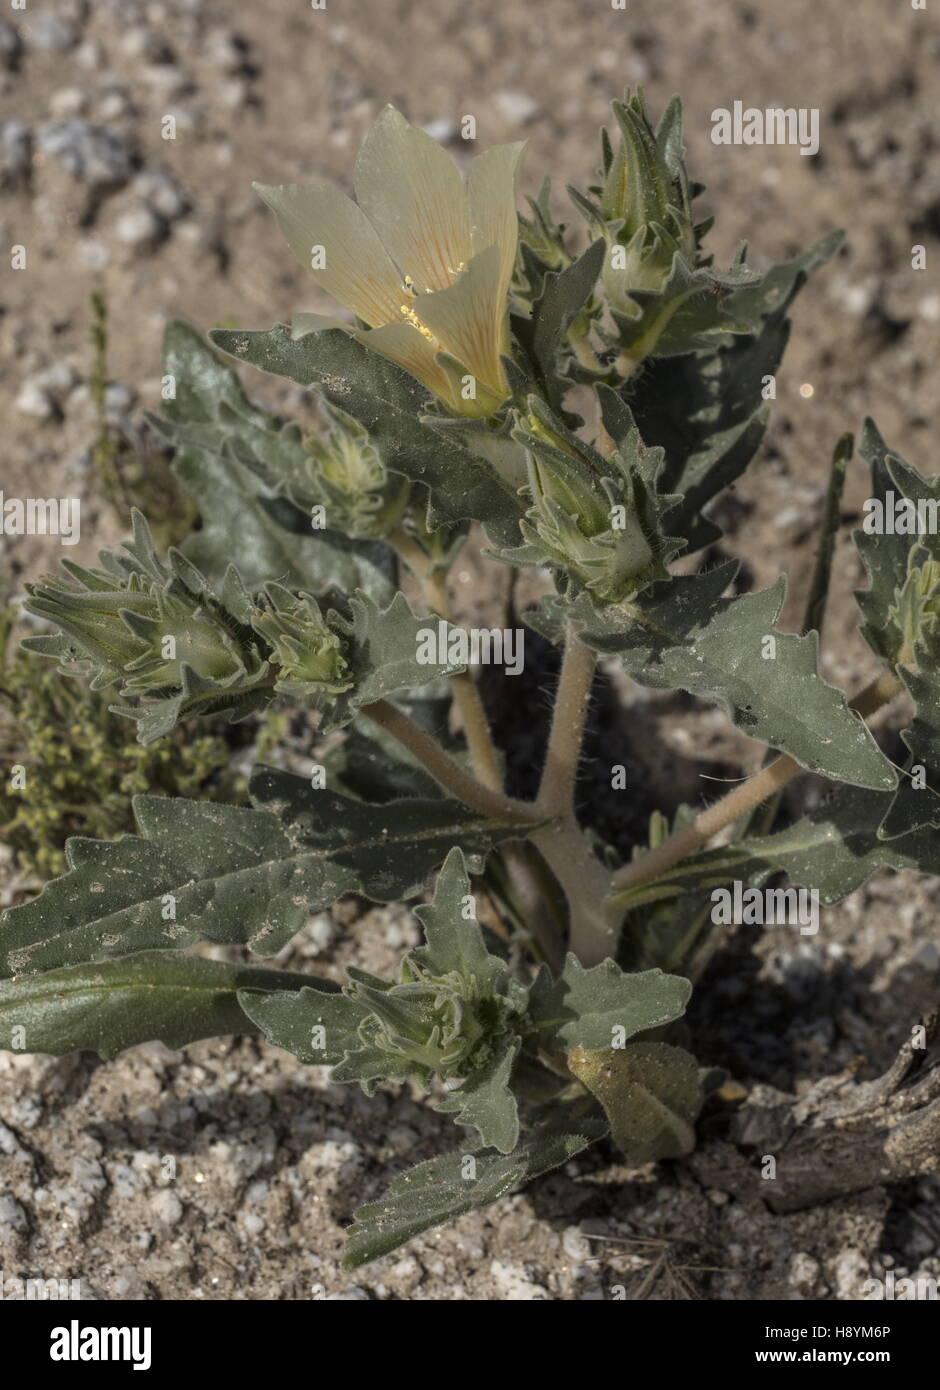 Sand Blazing Star Mentzelia Involucrata In Flower In The Sonoran